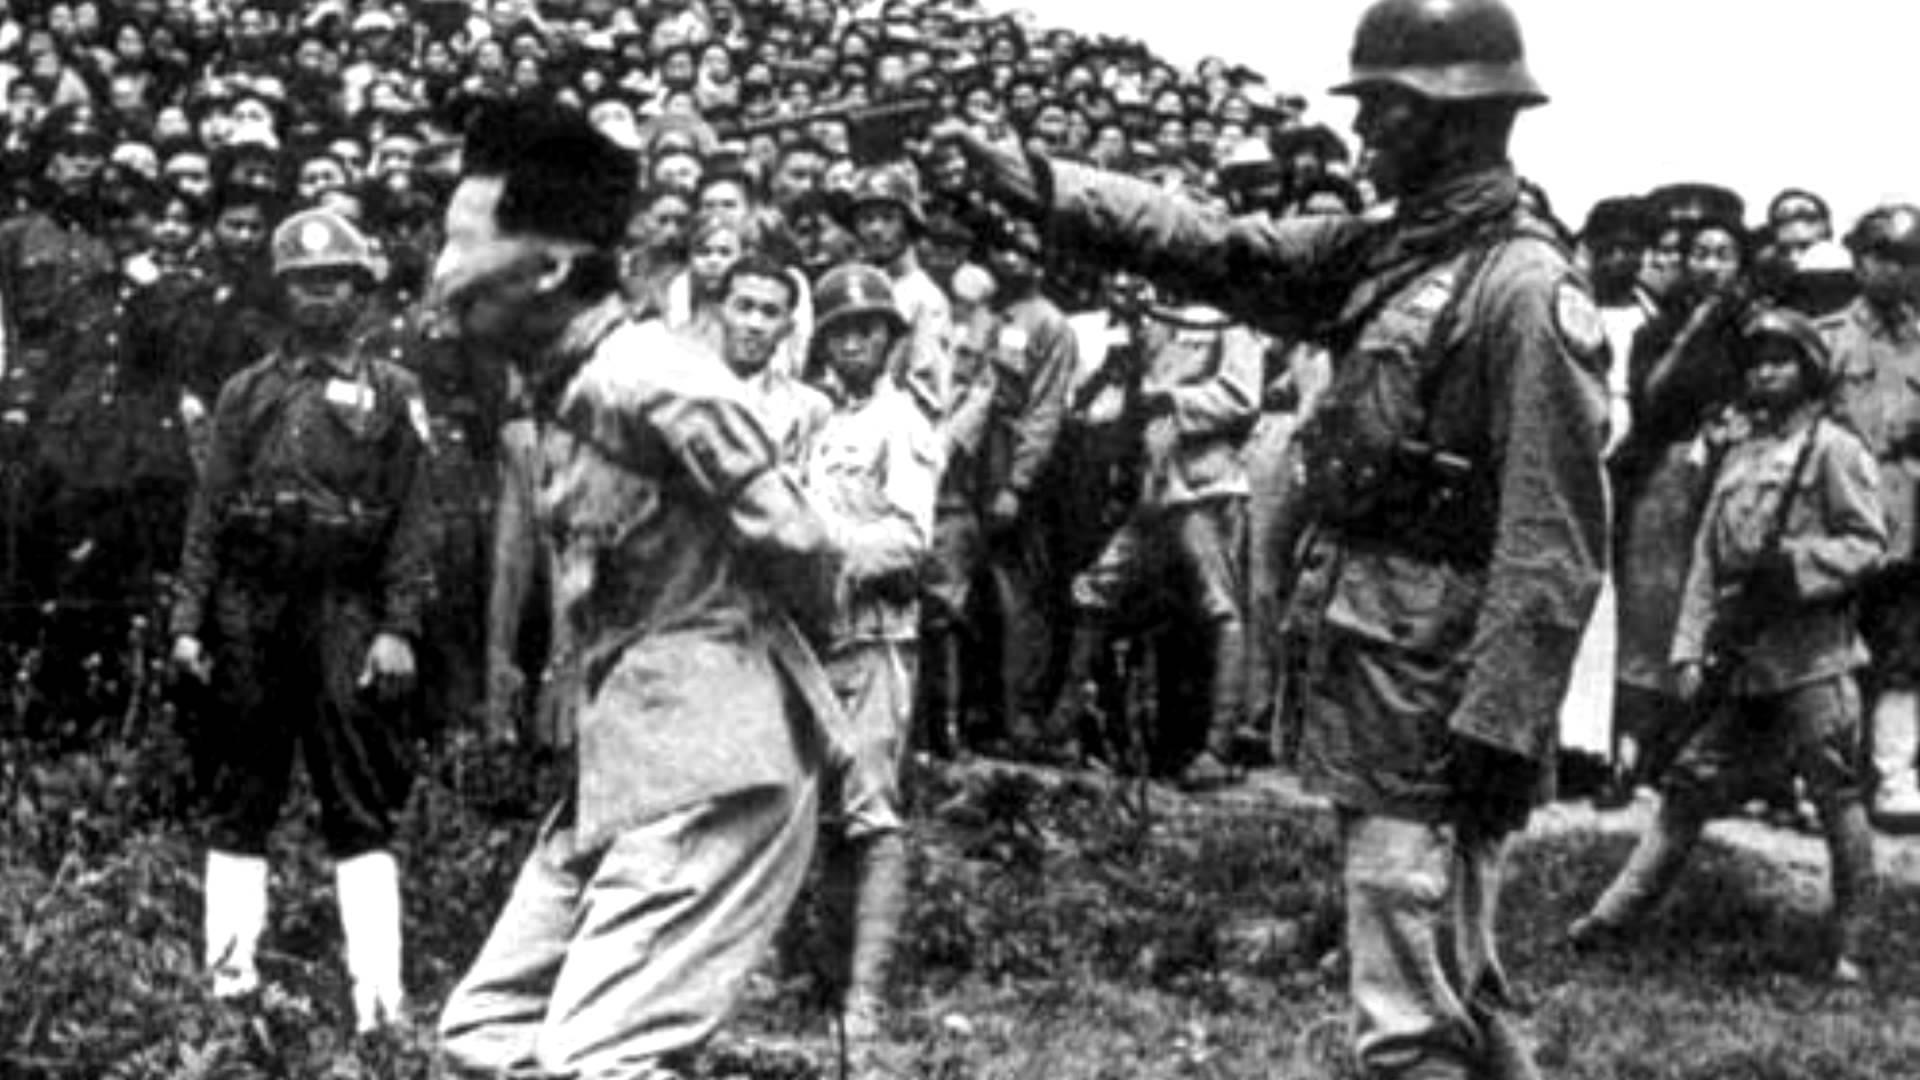 Dispariția stranie a două batalioane chinezești lângă Nanking